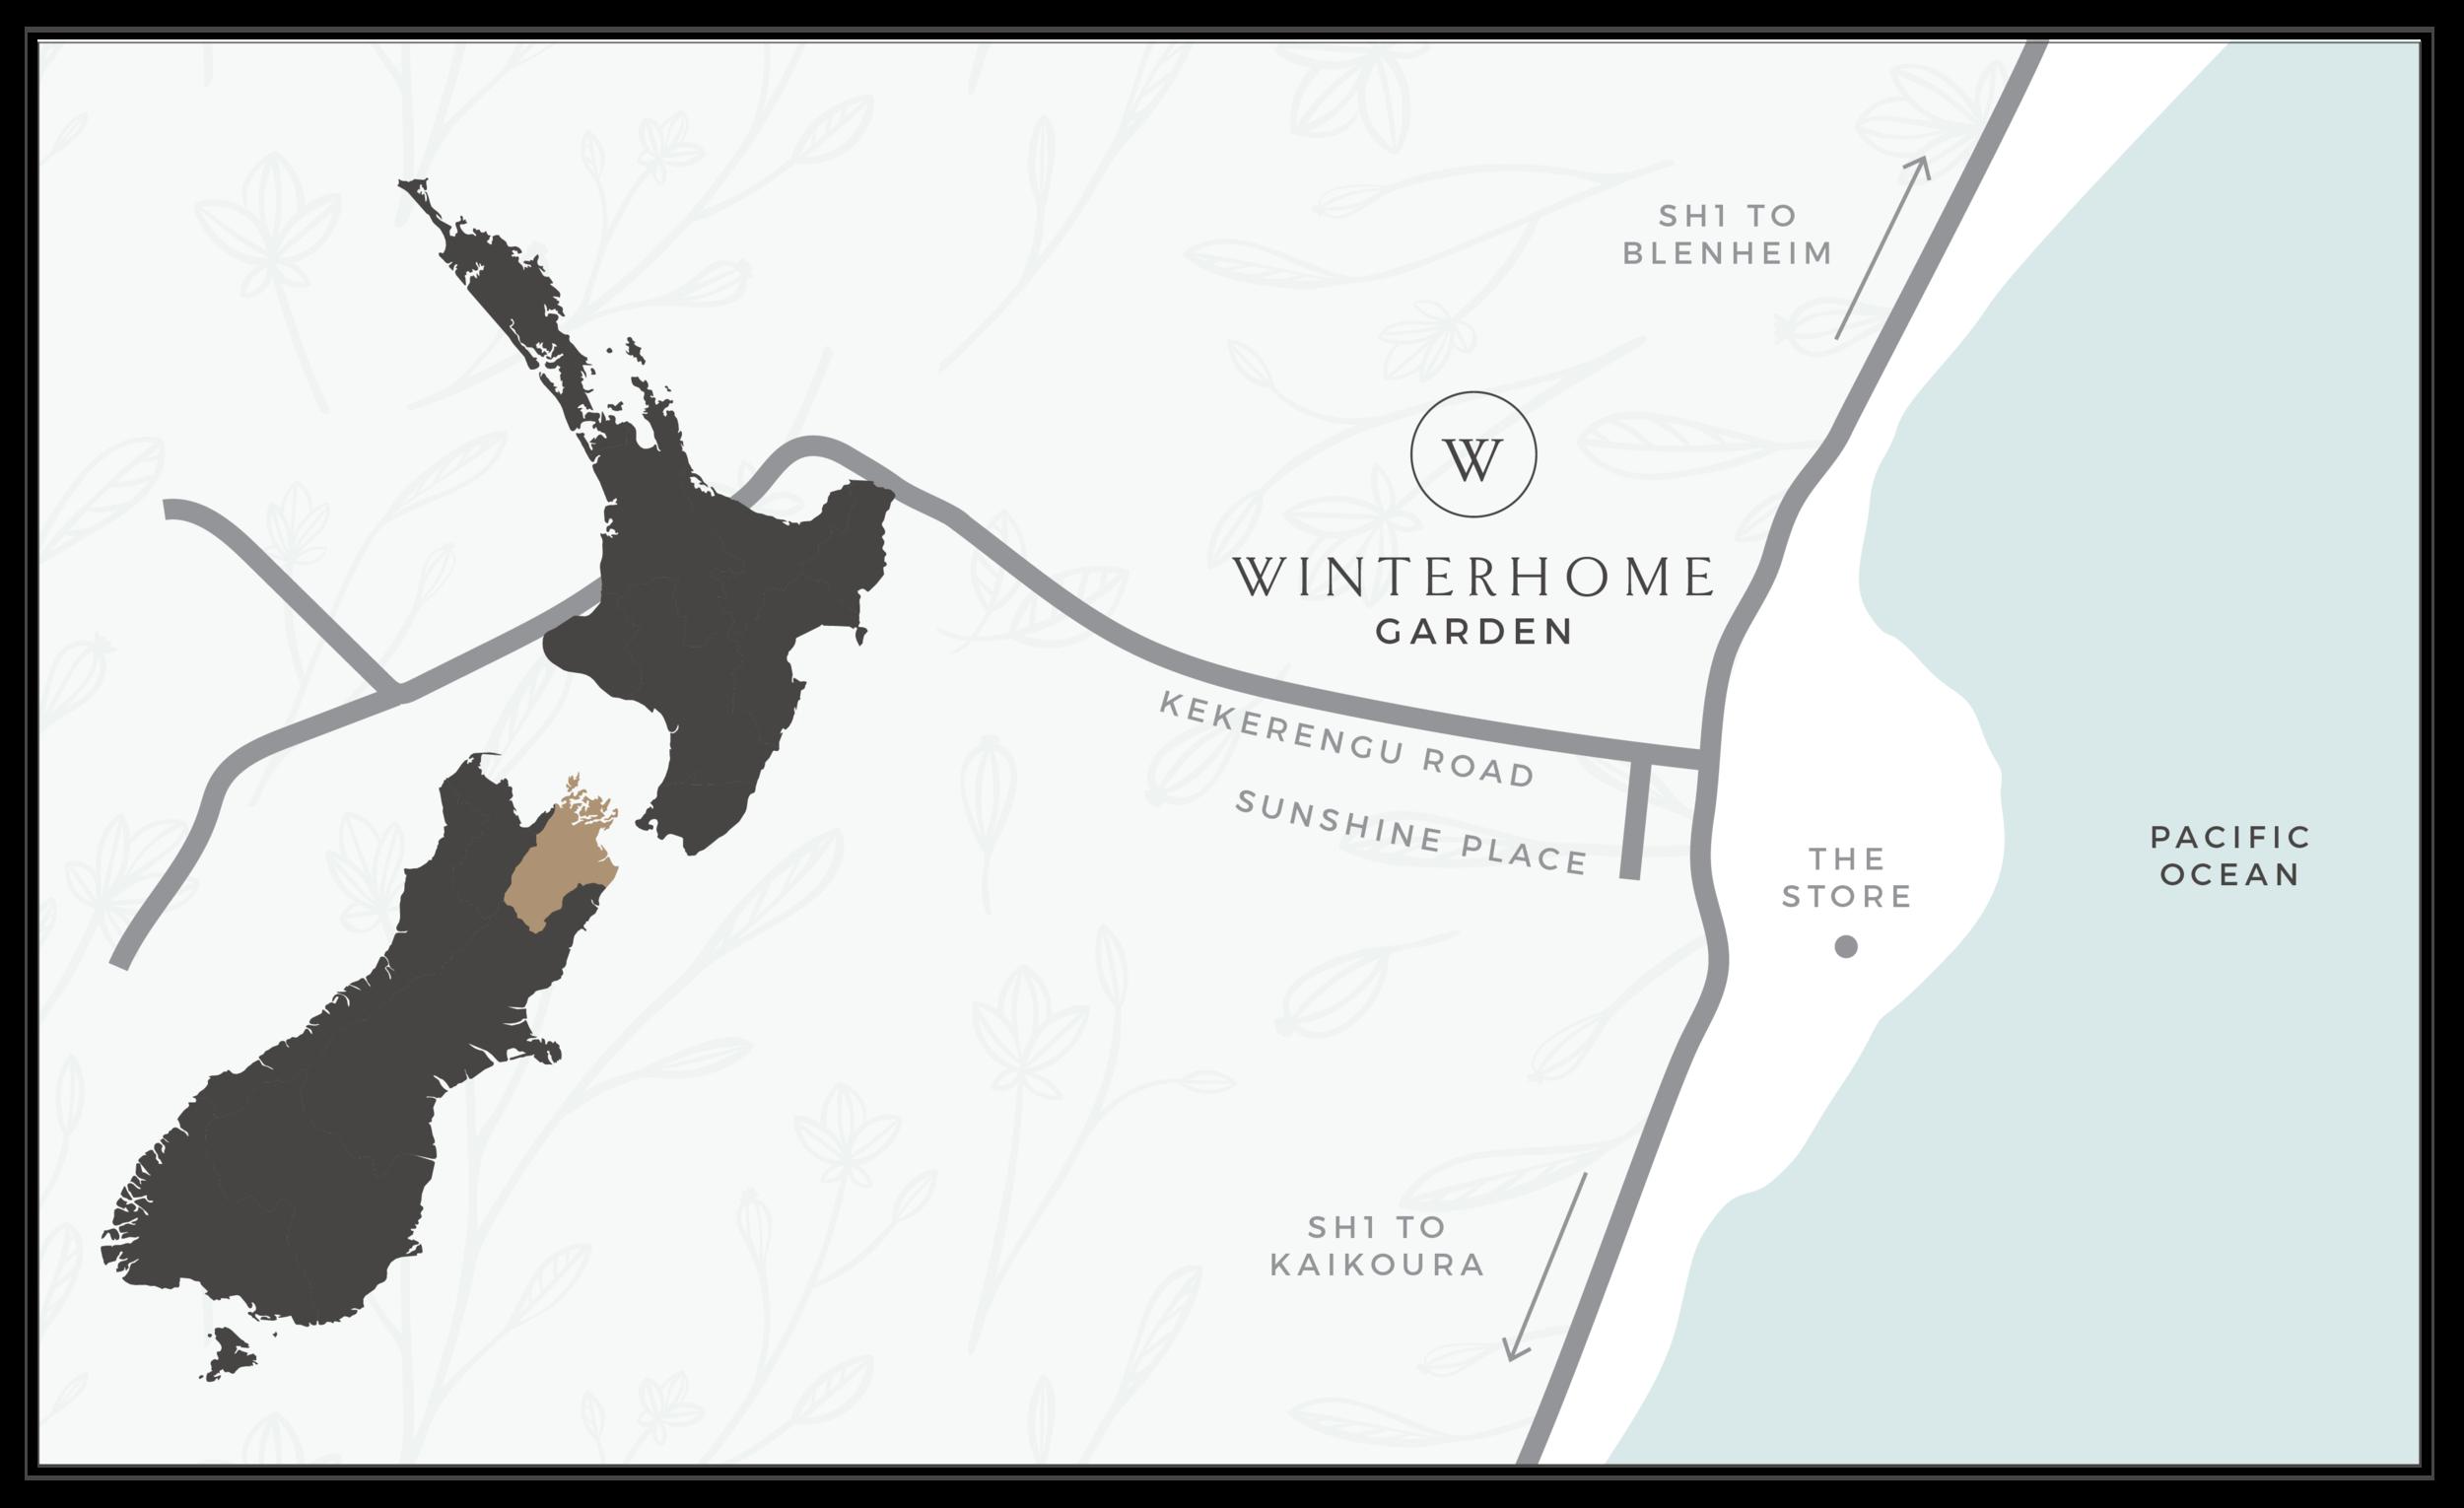 Map of Winterhome